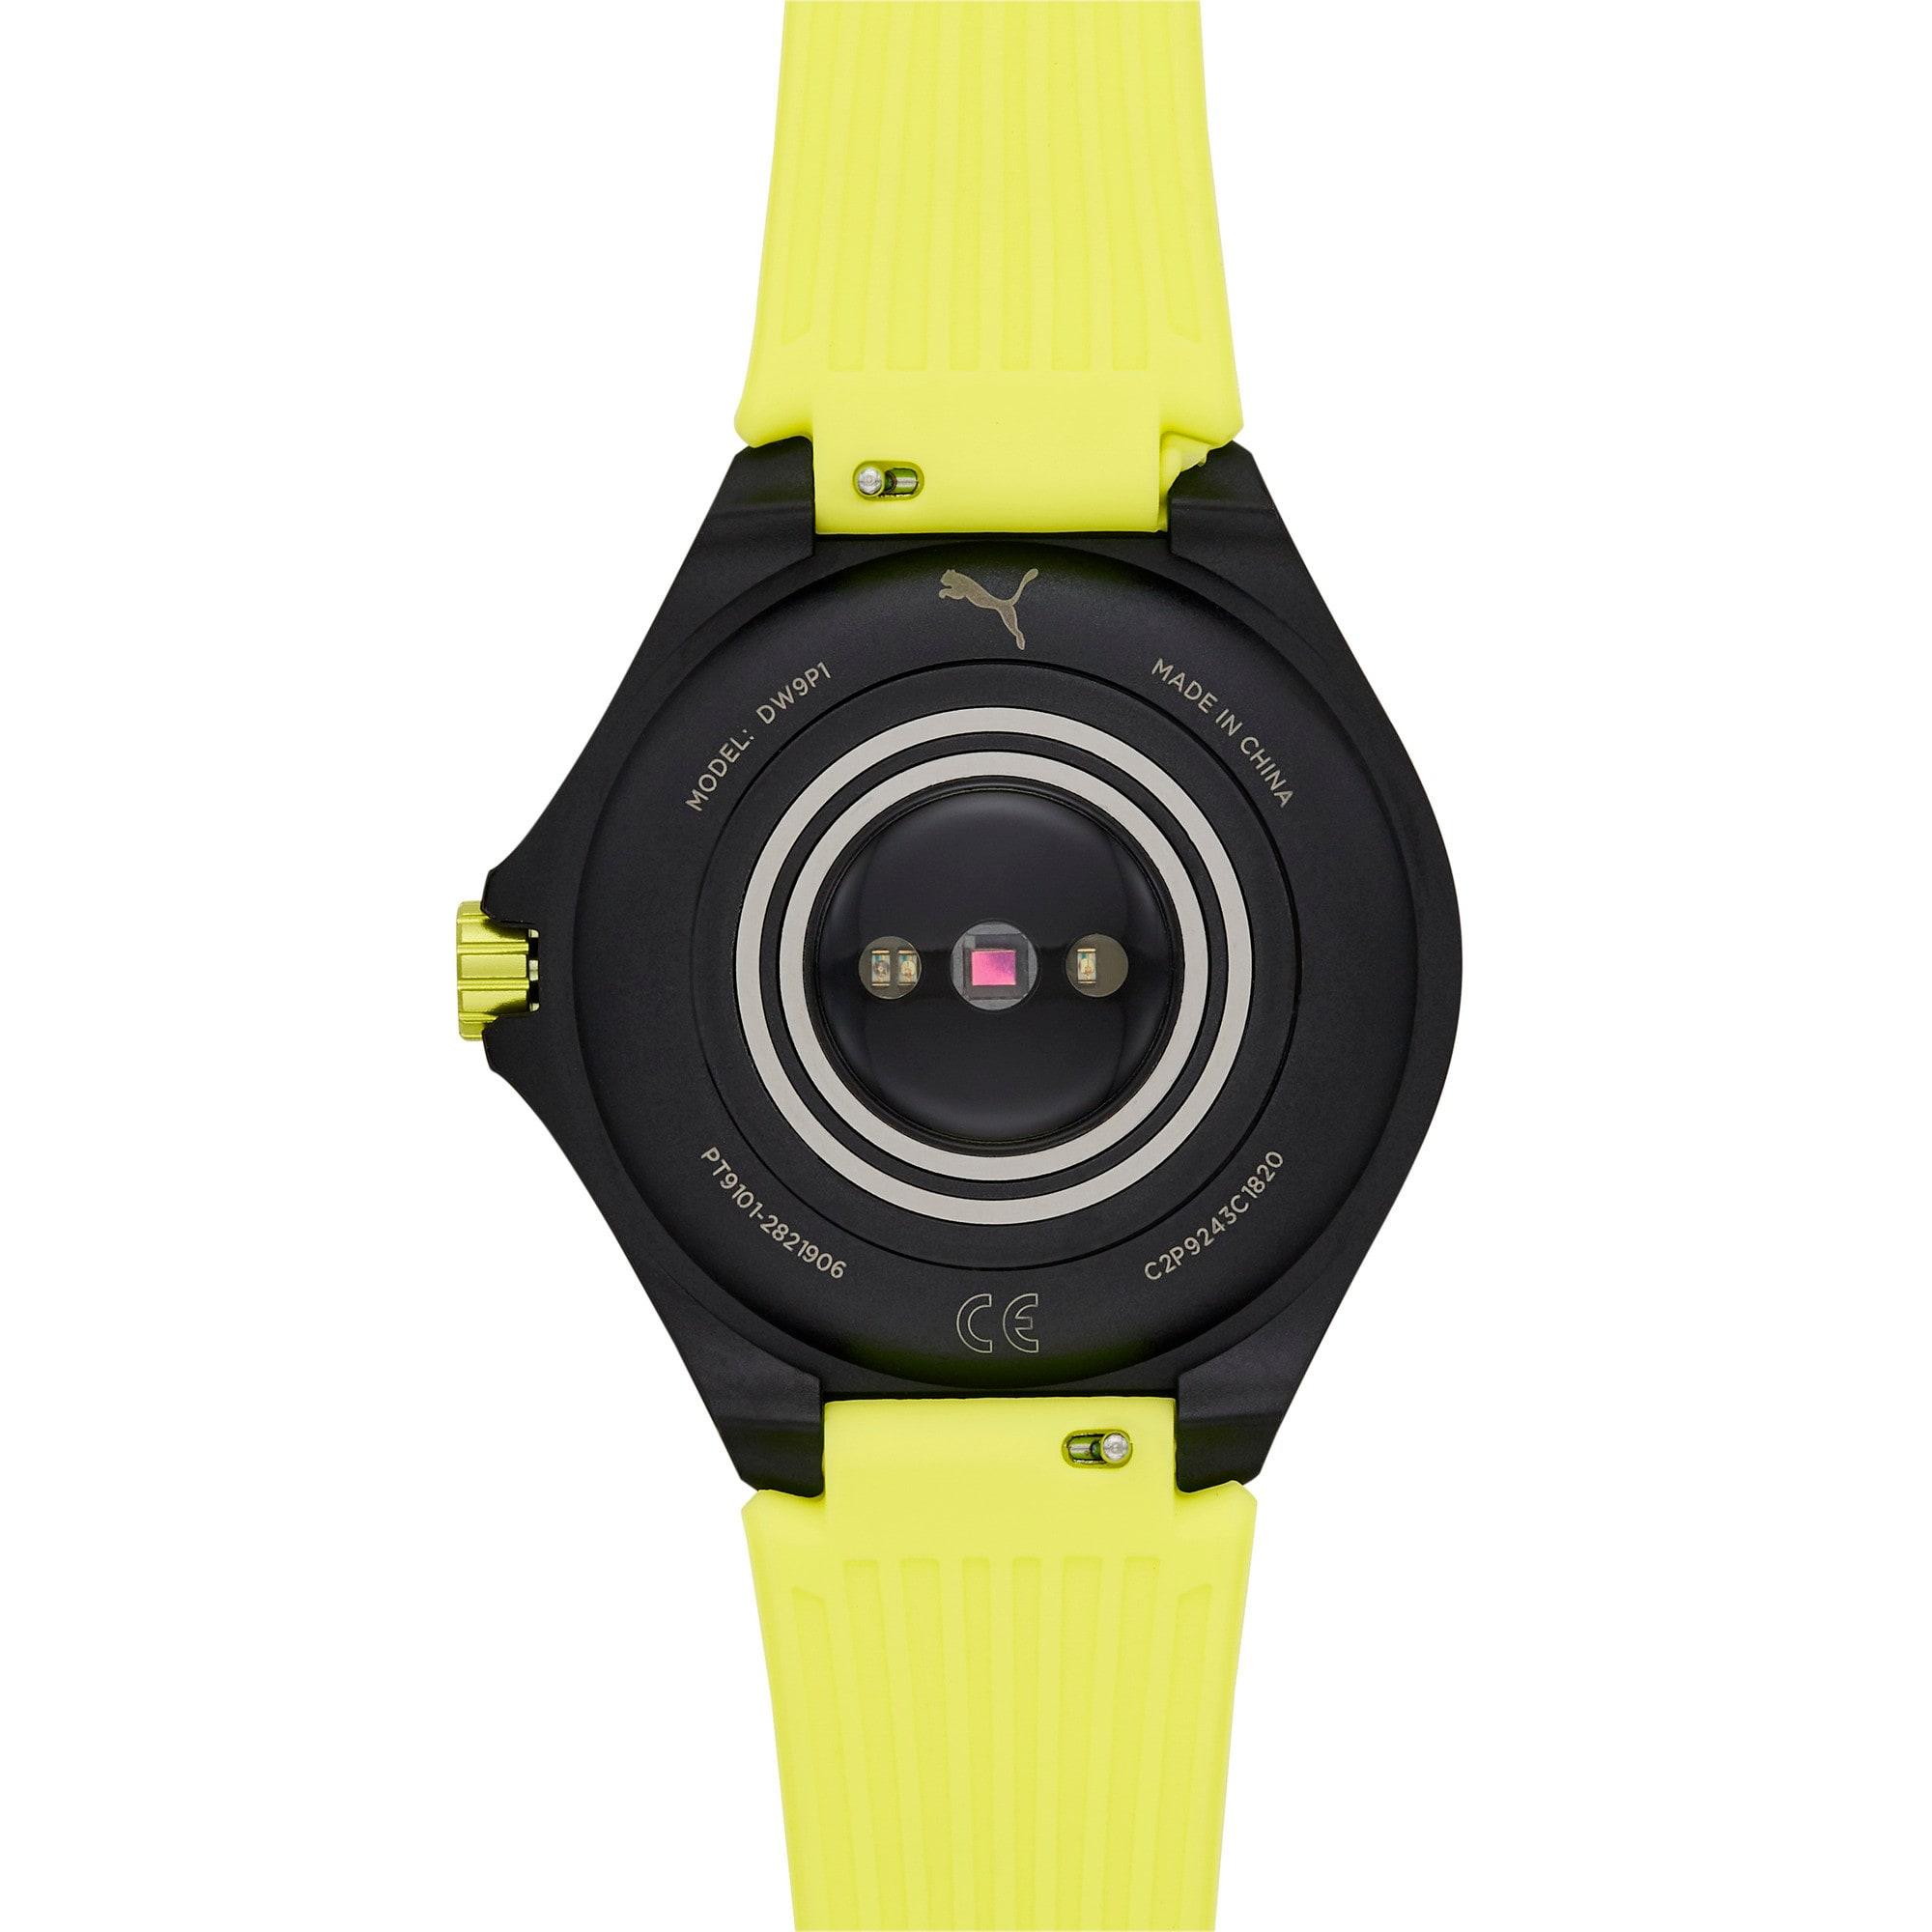 Thumbnail 5 of PUMA Smartwatch, Yellow/Black, medium